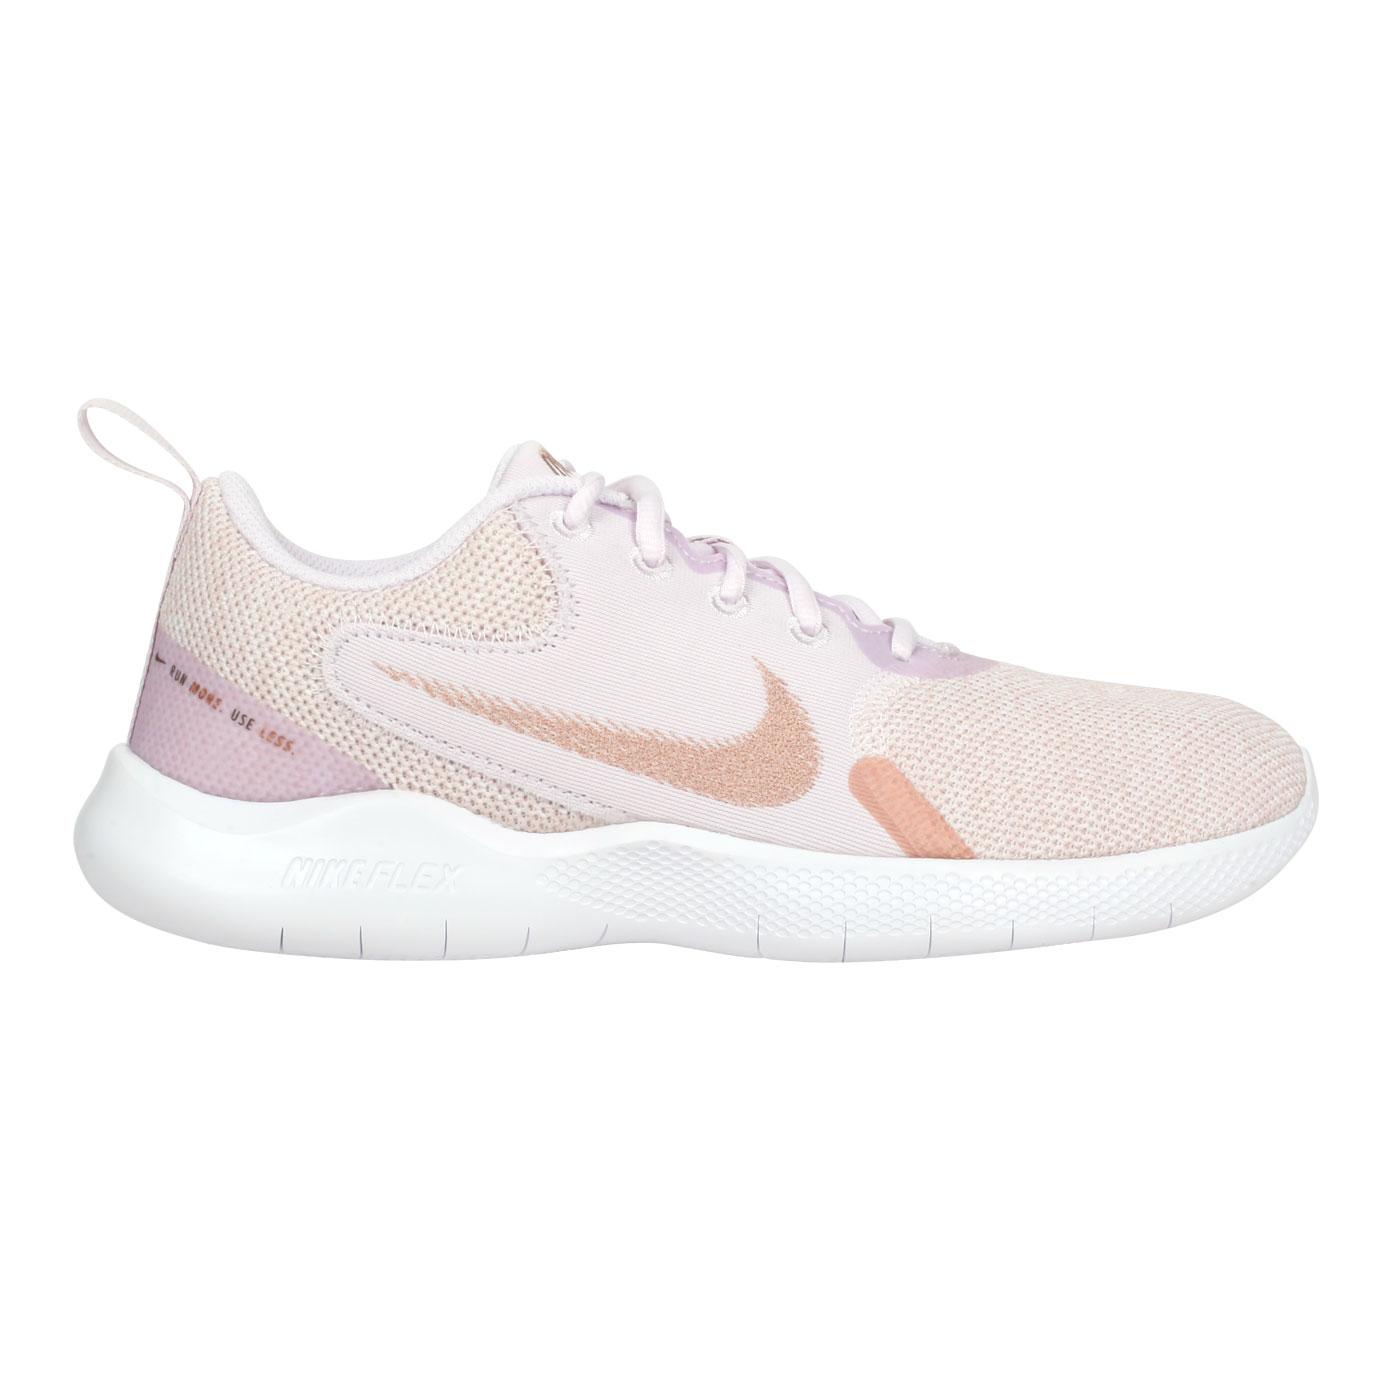 NIKE 女款運動休閒鞋  @WMNS FLEX EXPERIENCE RN 10@CI9964600 - 紫粉玫瑰金